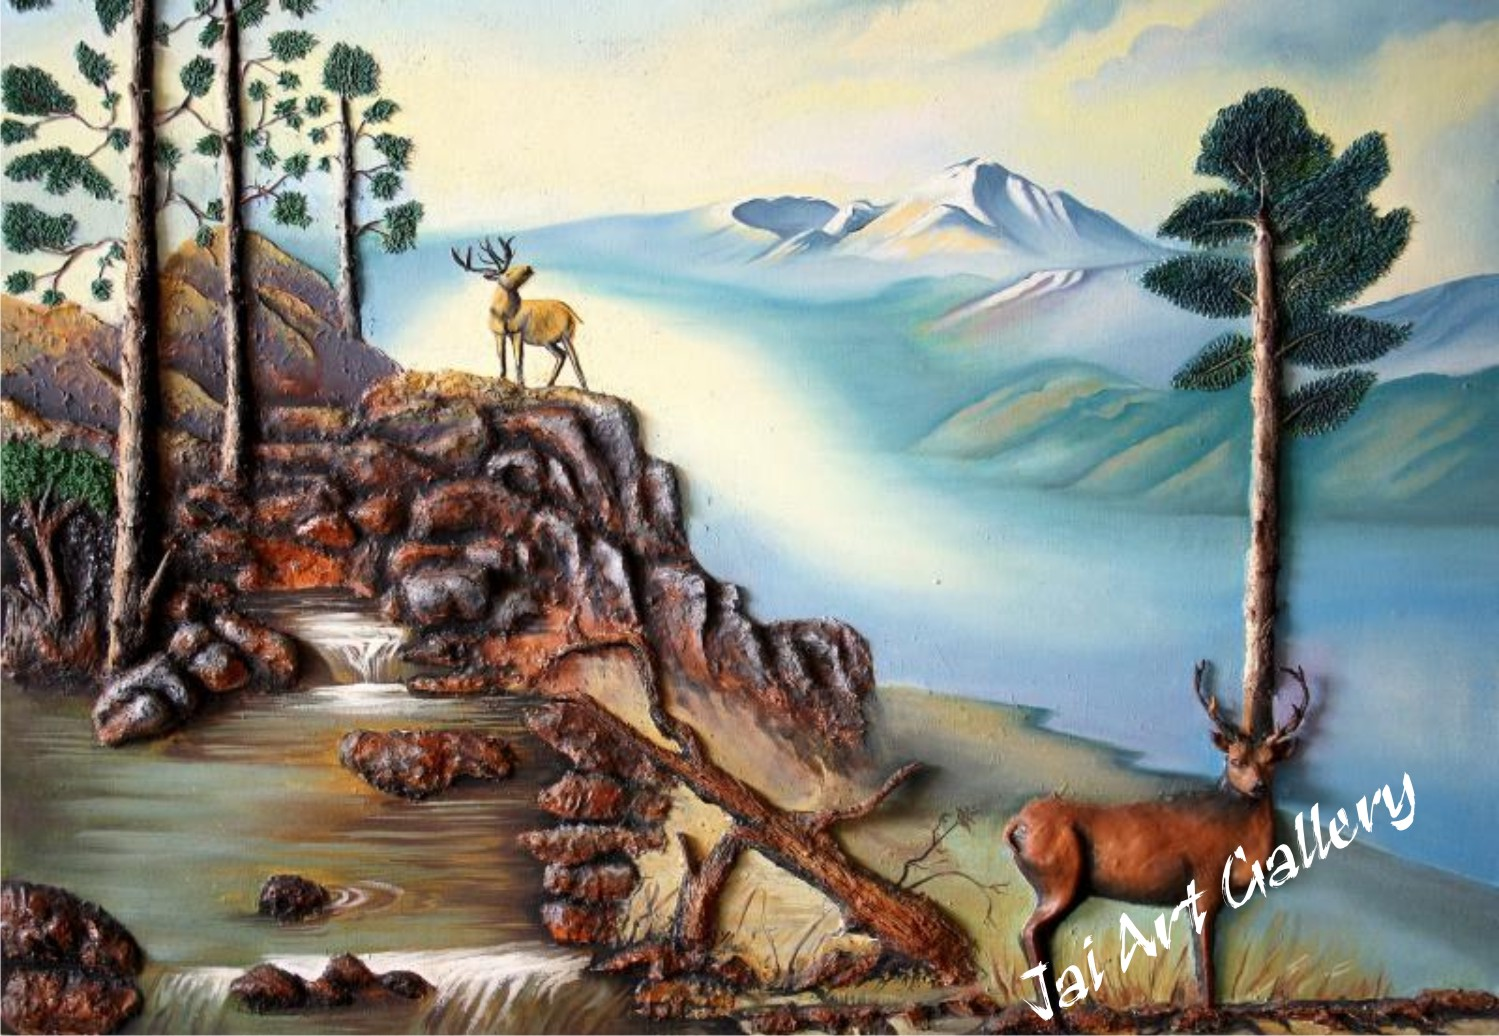 Jai art gallery mural works for Artistic mural works